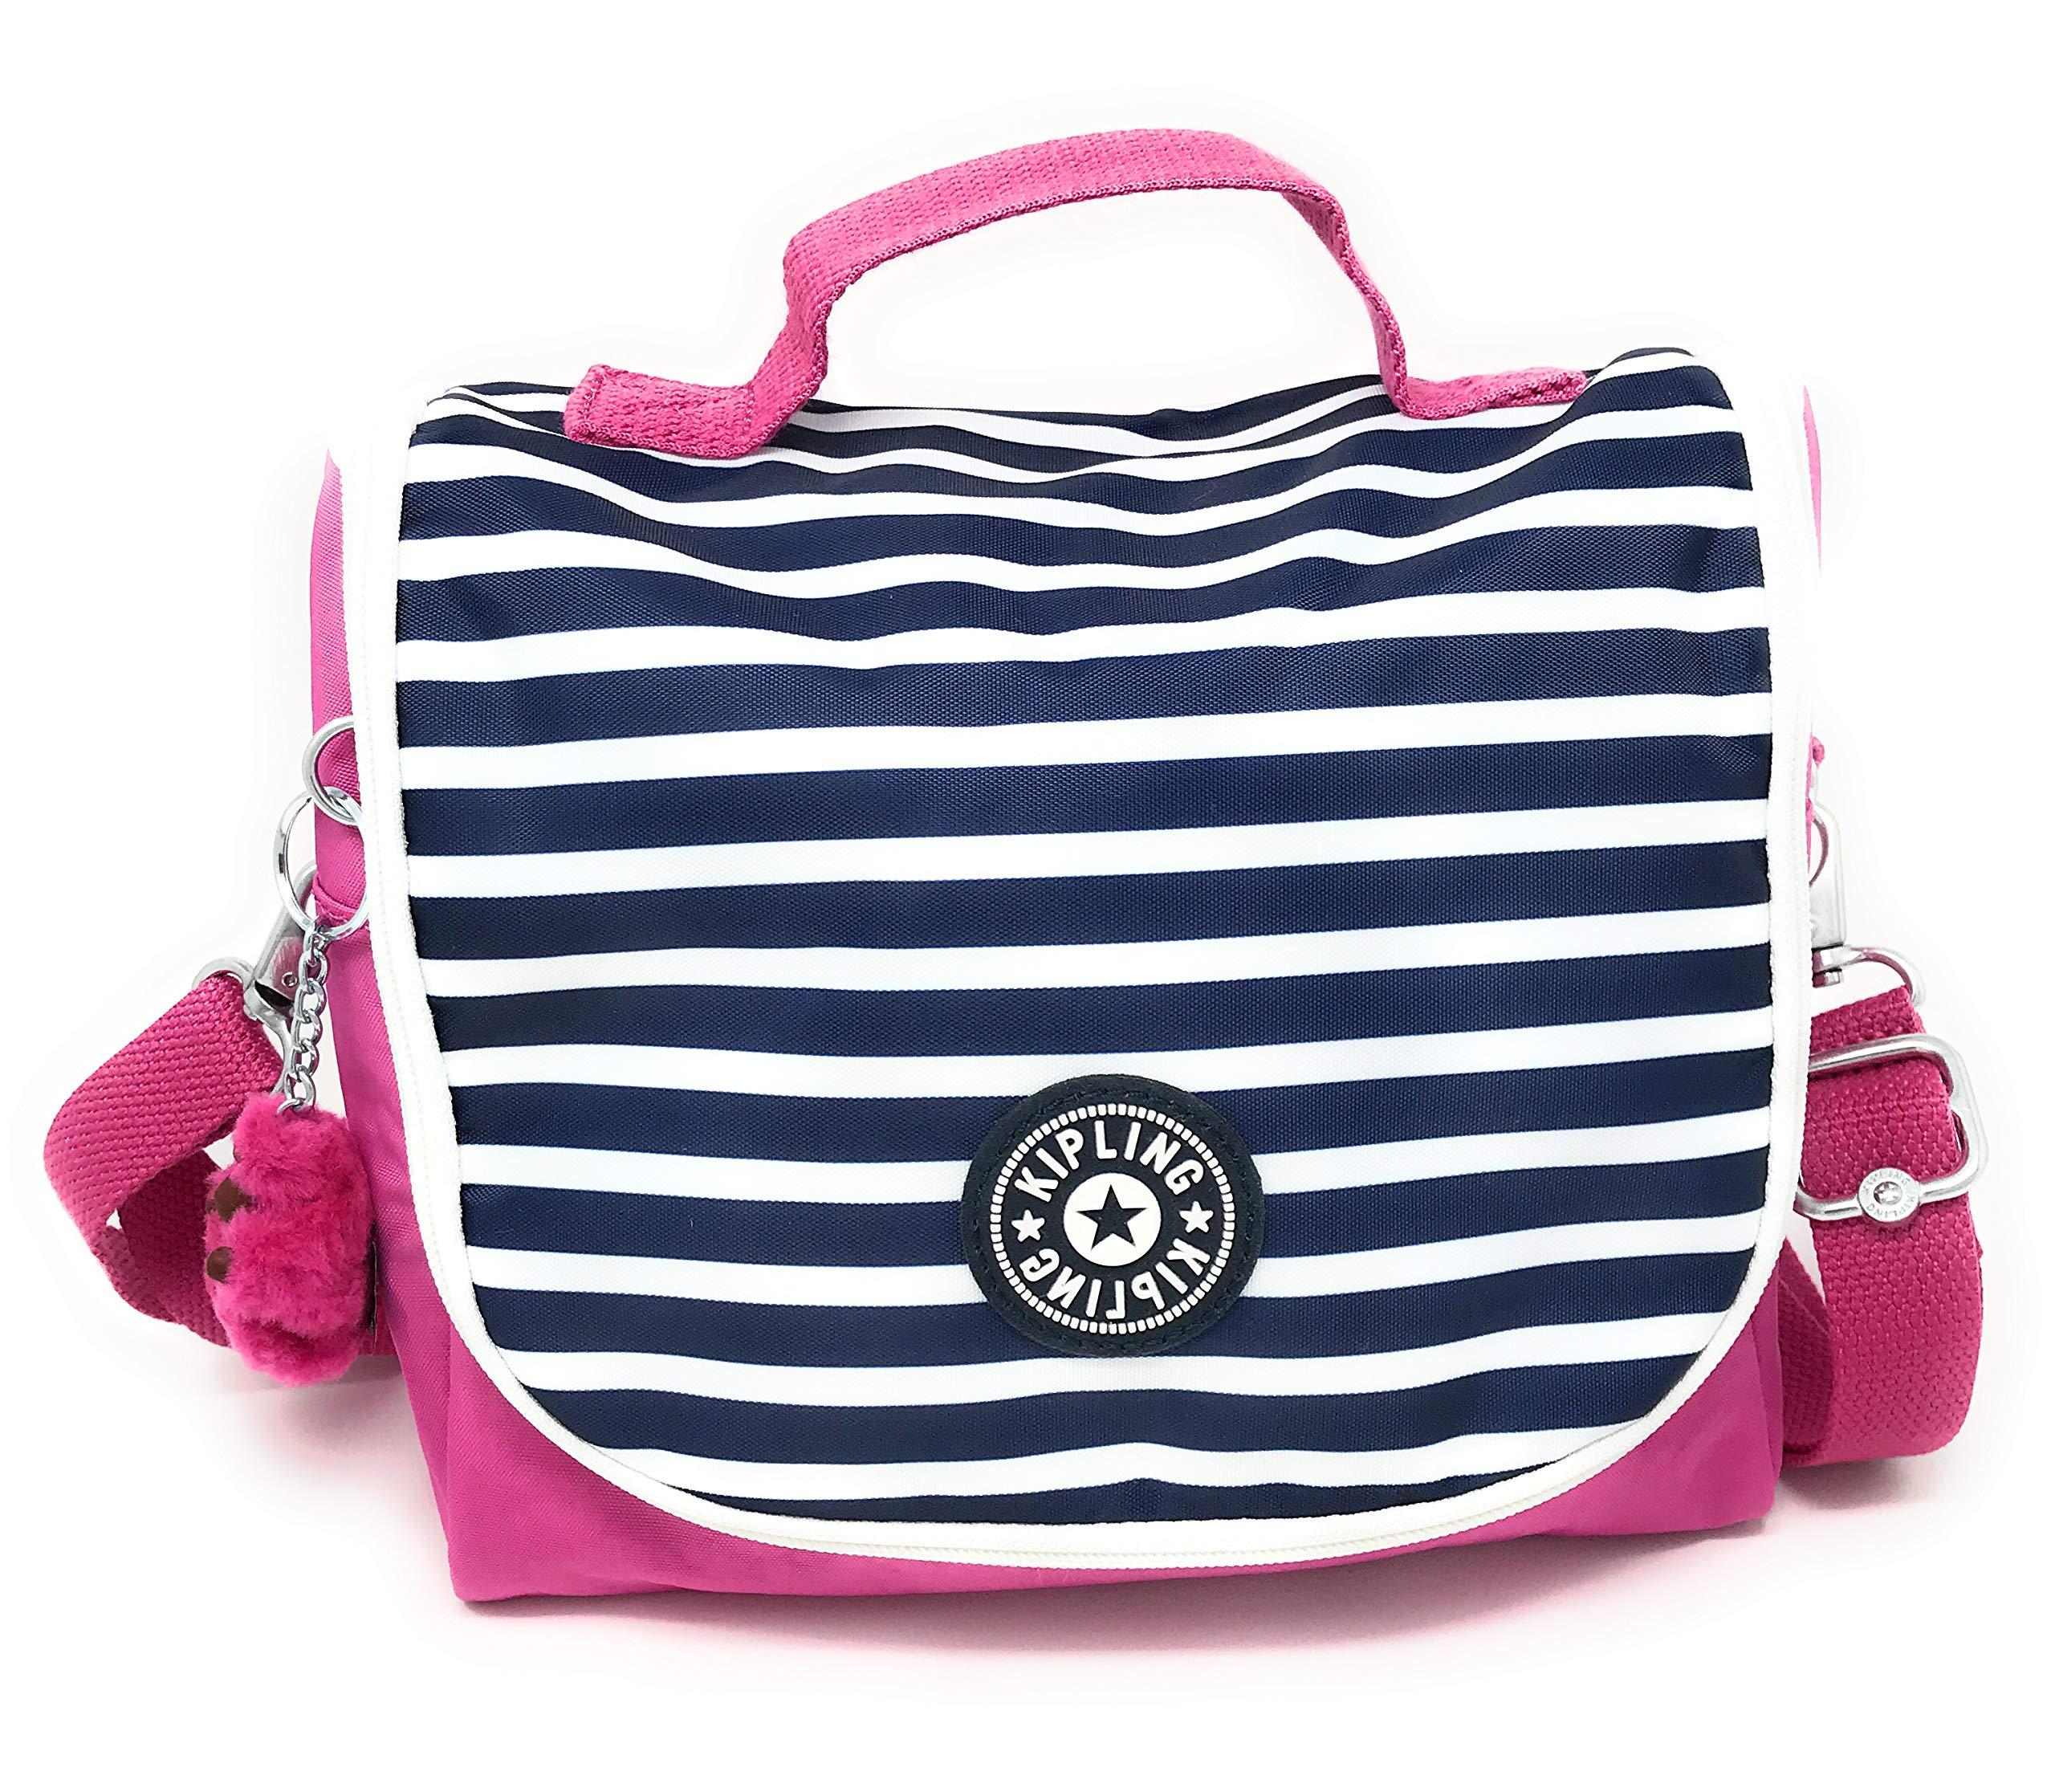 Kipling Kichirou Insulated Lunch Bag, Removable, Adjustable Crossbody Strap, Zip Closure